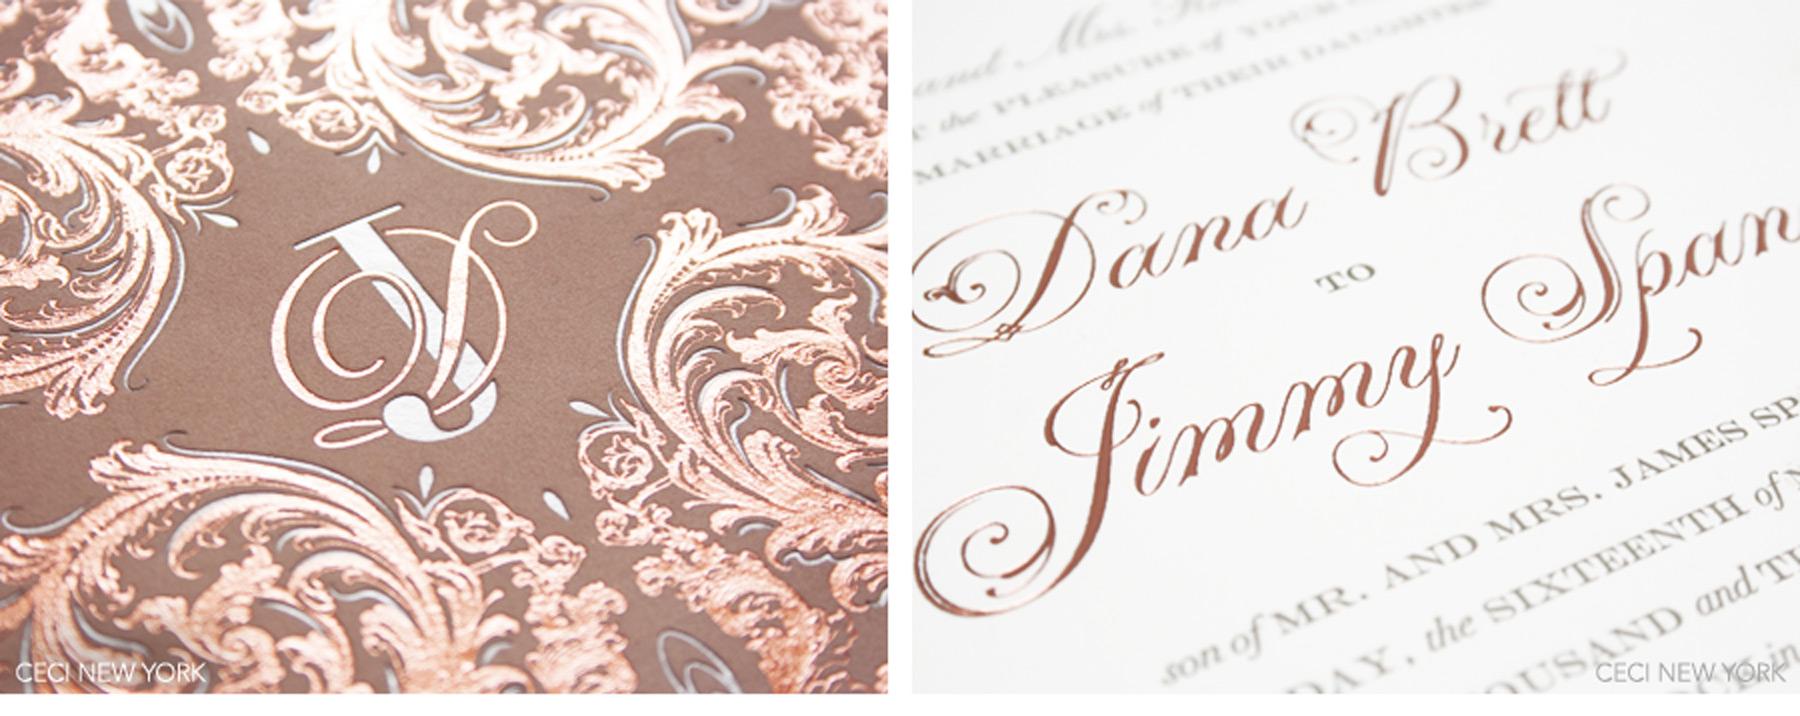 Wedding Invitations Rose: Romantic Rose Gold Wedding: Dana & Jimmy